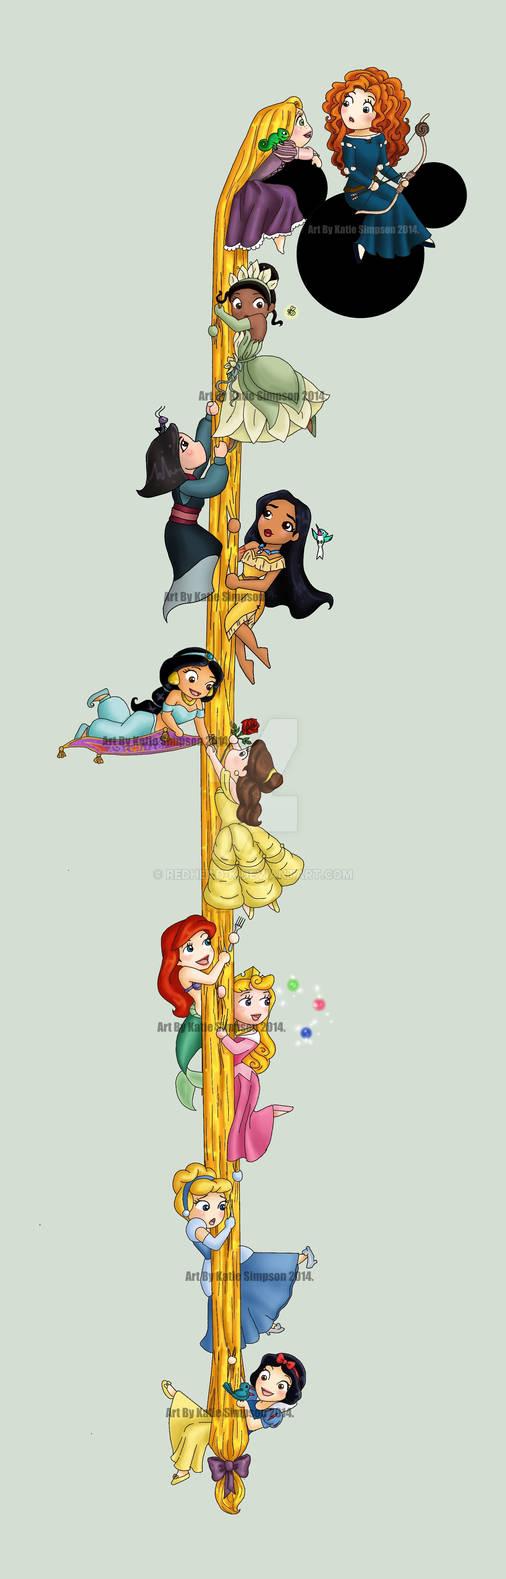 Welcome Princess Merida update